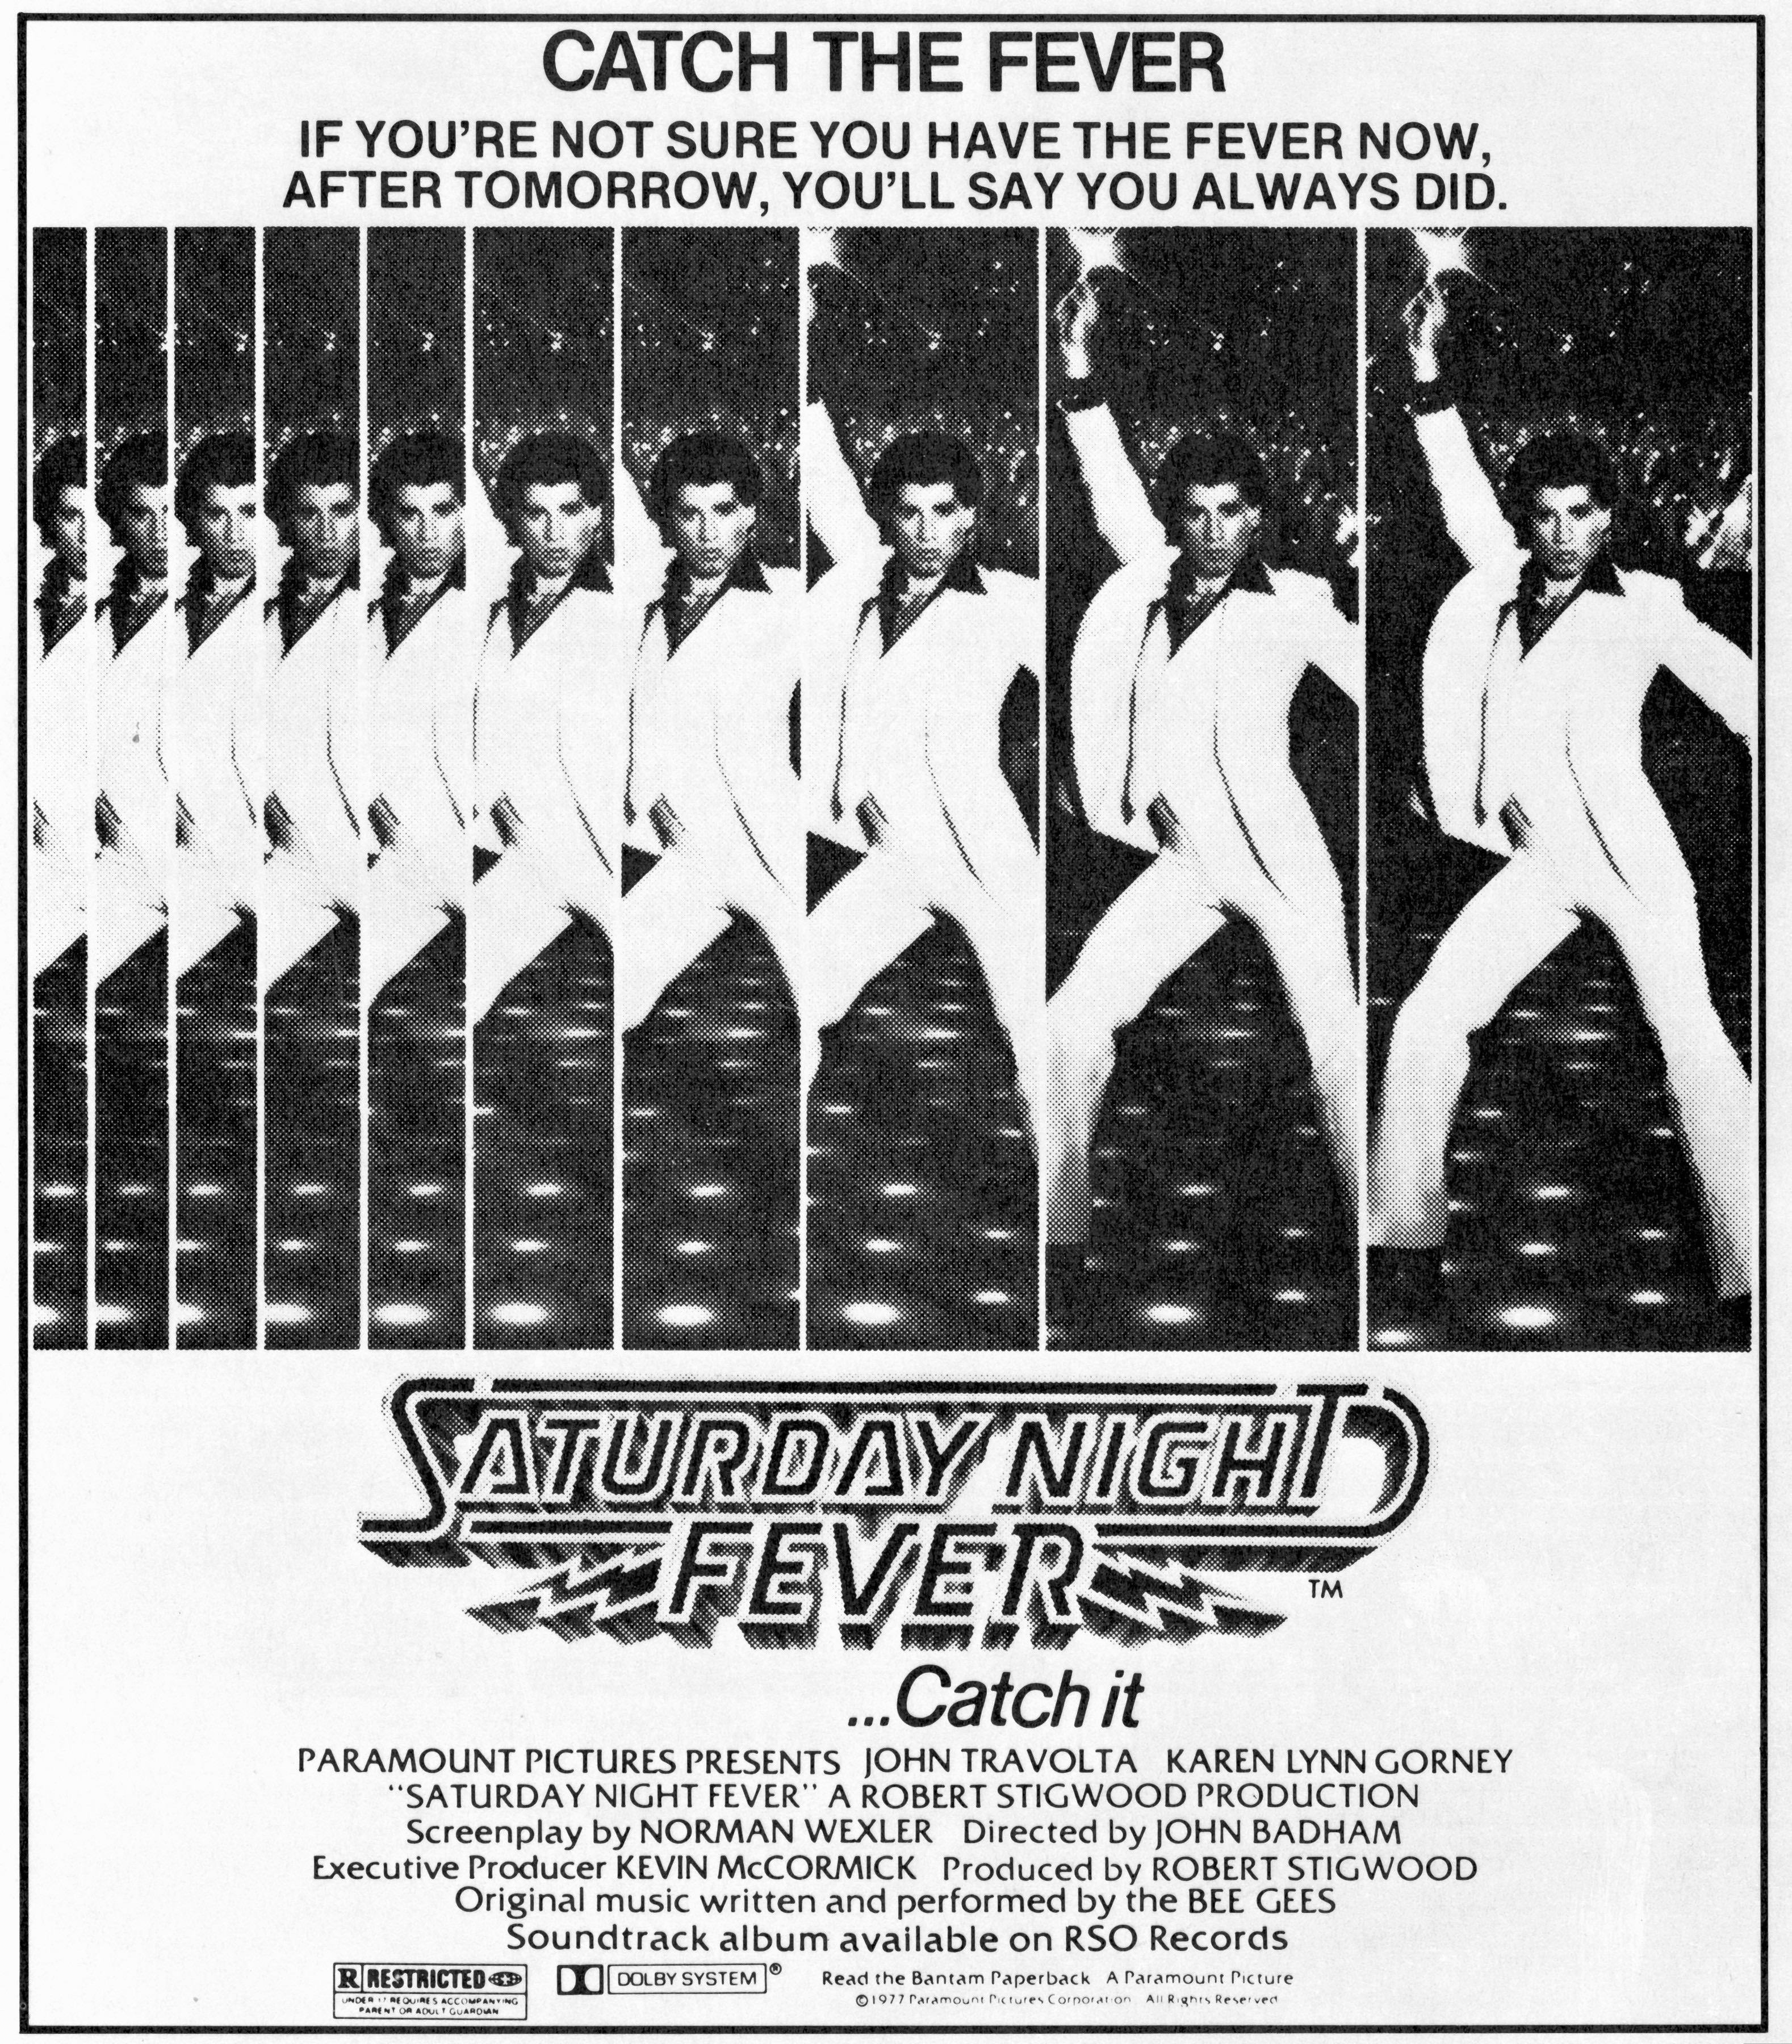 saturday night fever film download free